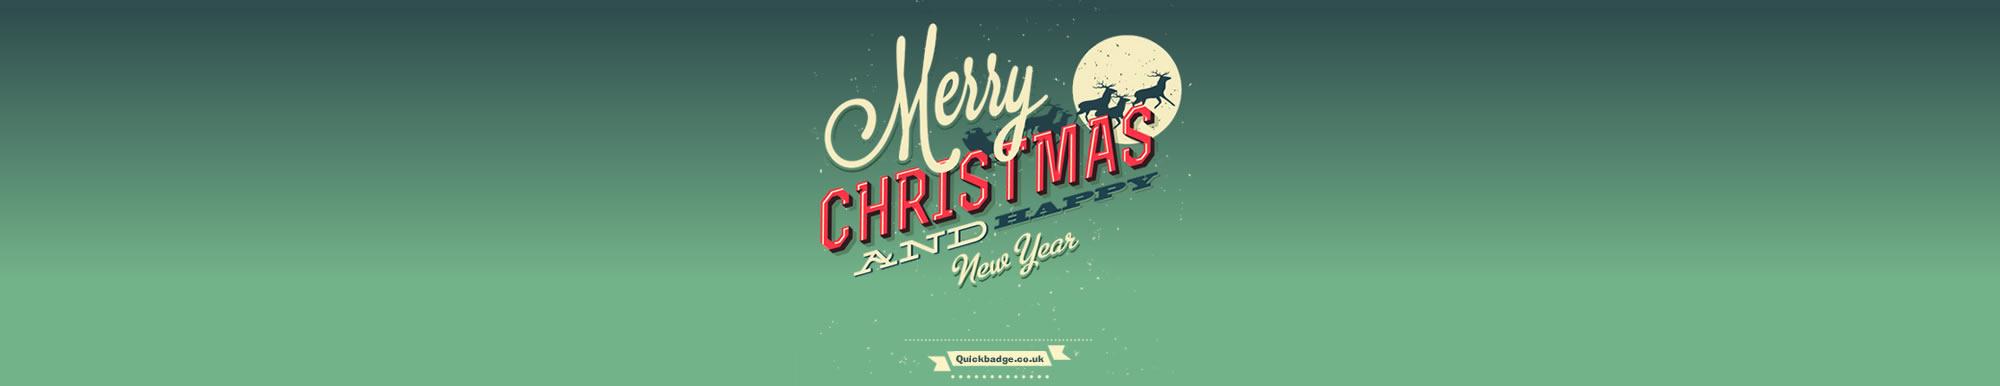 Quickbadge Christmas